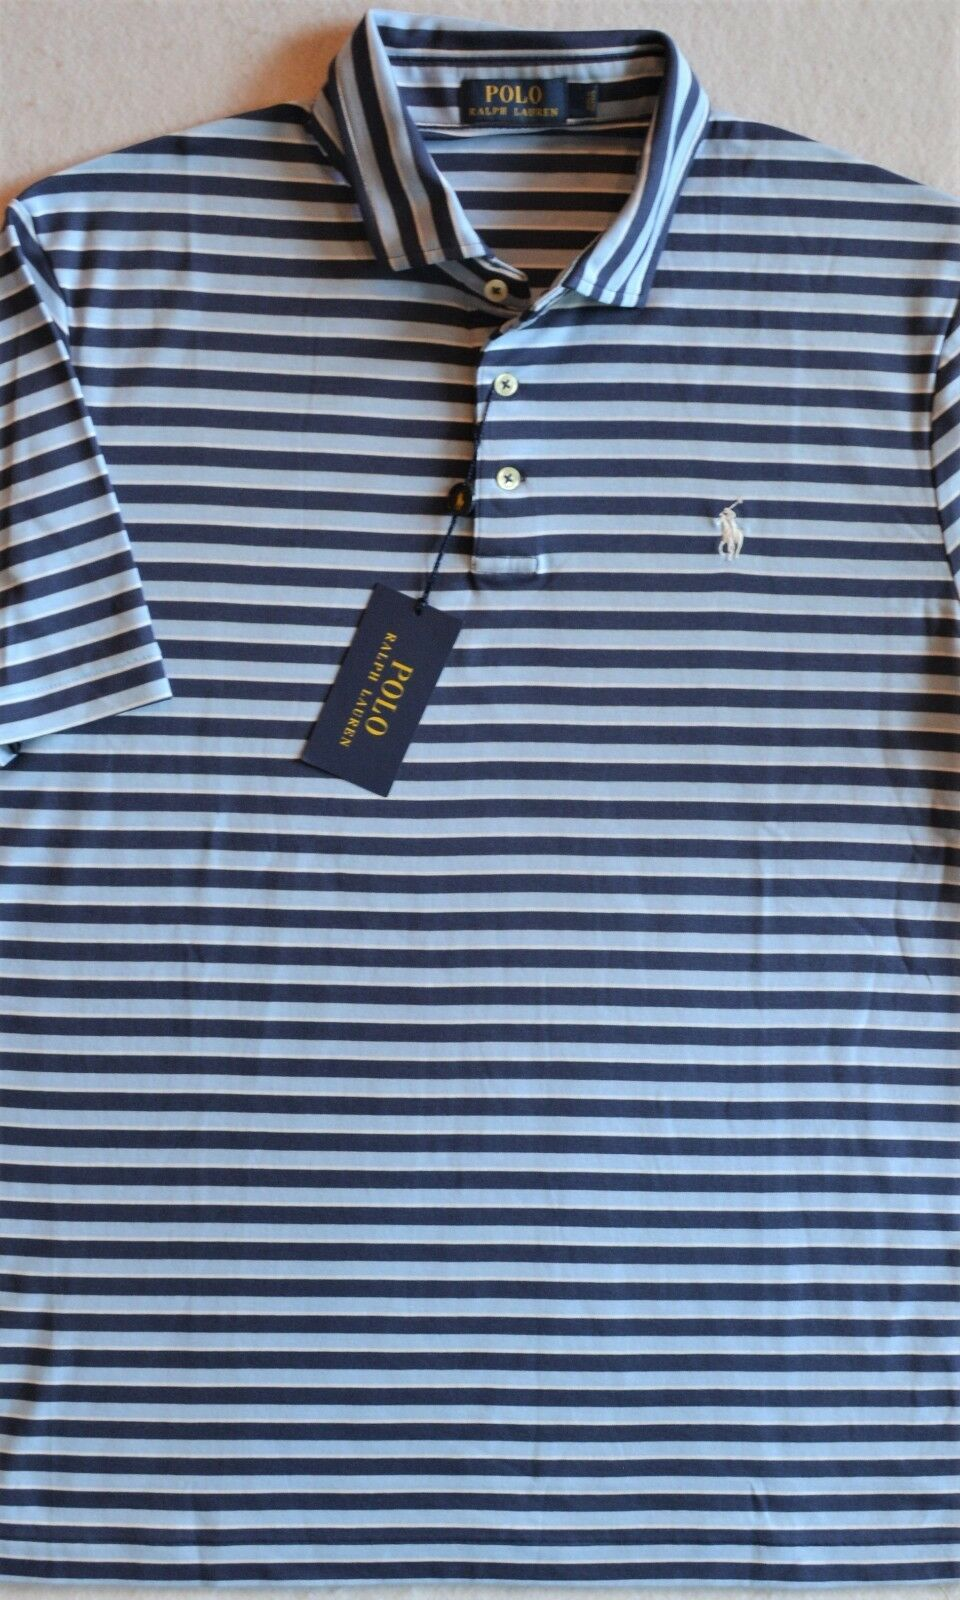 ca0f1c25f38b9 Polo Ralph Lauren Soft Touch Striped   XL NWT Shirt L nyshrq6874-Casual  Shirts   Tops. Firetrap Men s Polo shirt White Short Sleeve ...